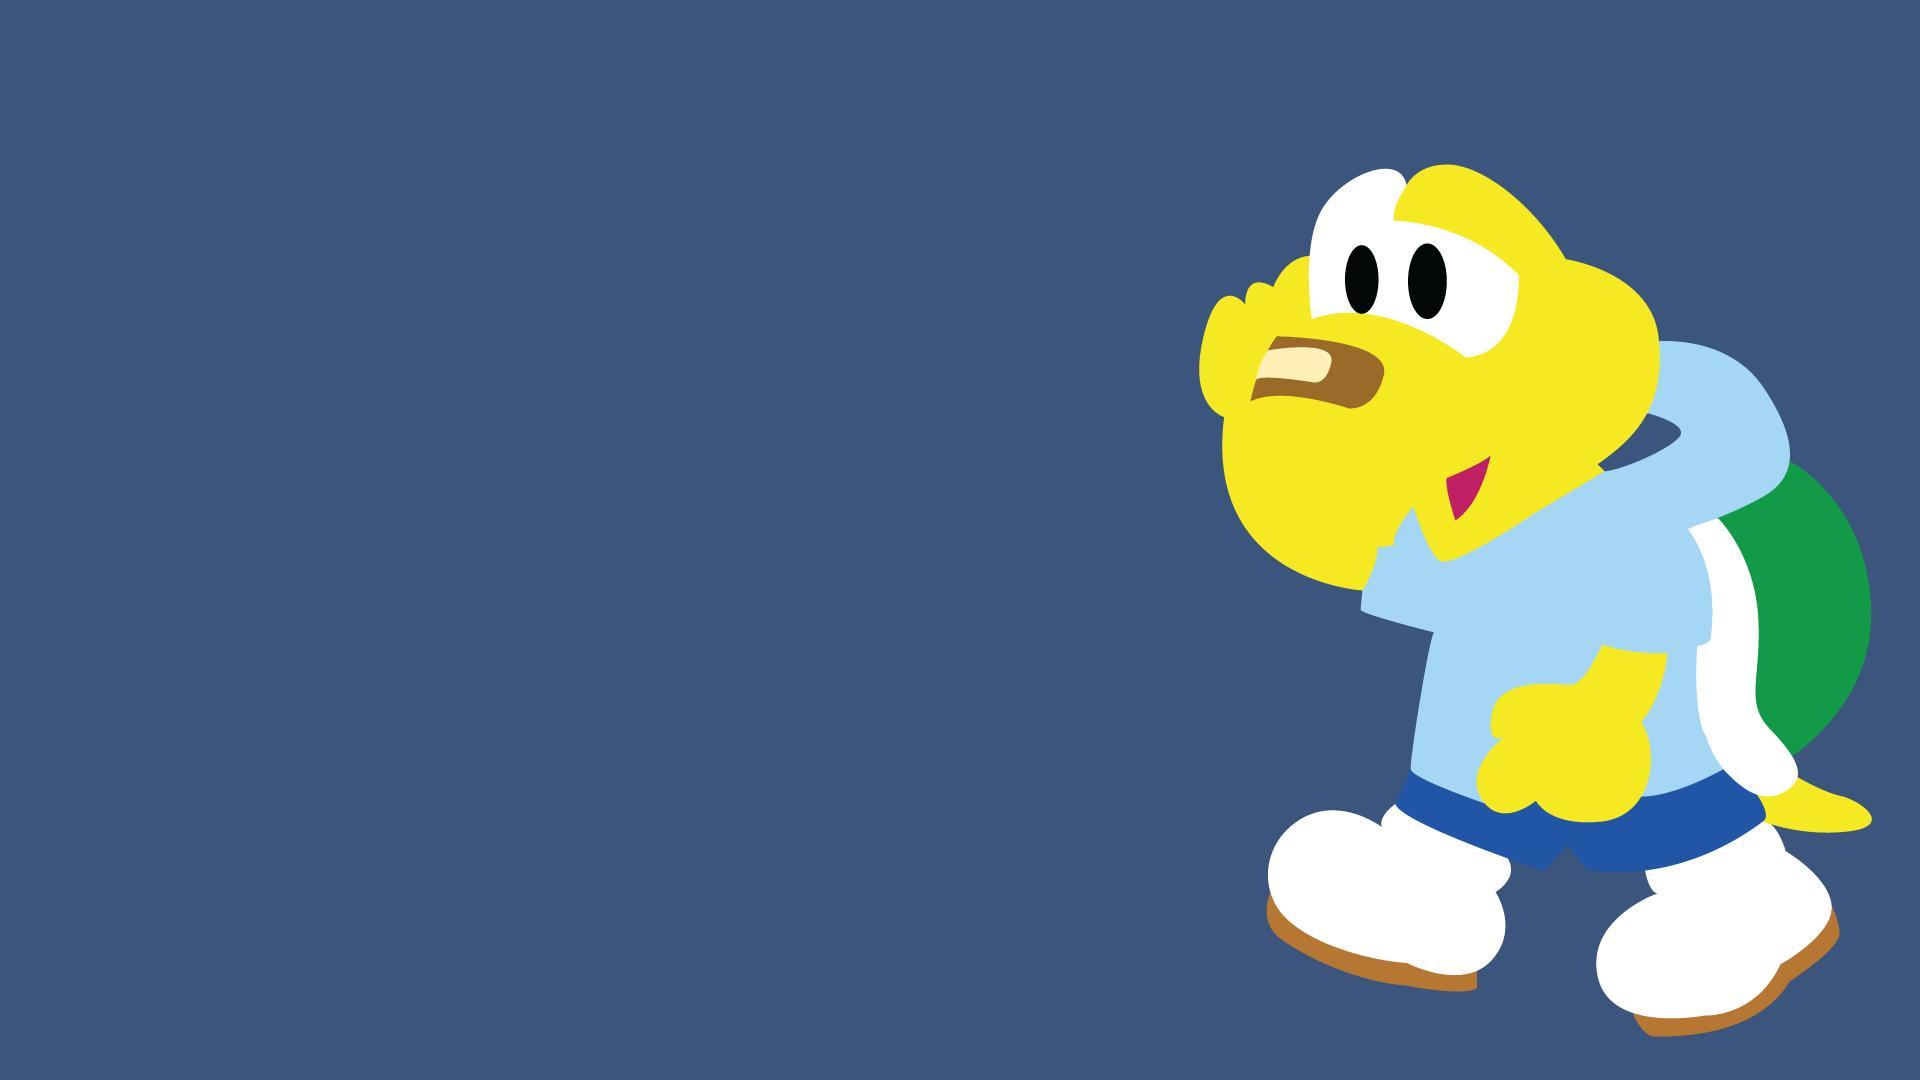 Mario Desktop Backgrounds: Minimal Super Mario Wallpaper